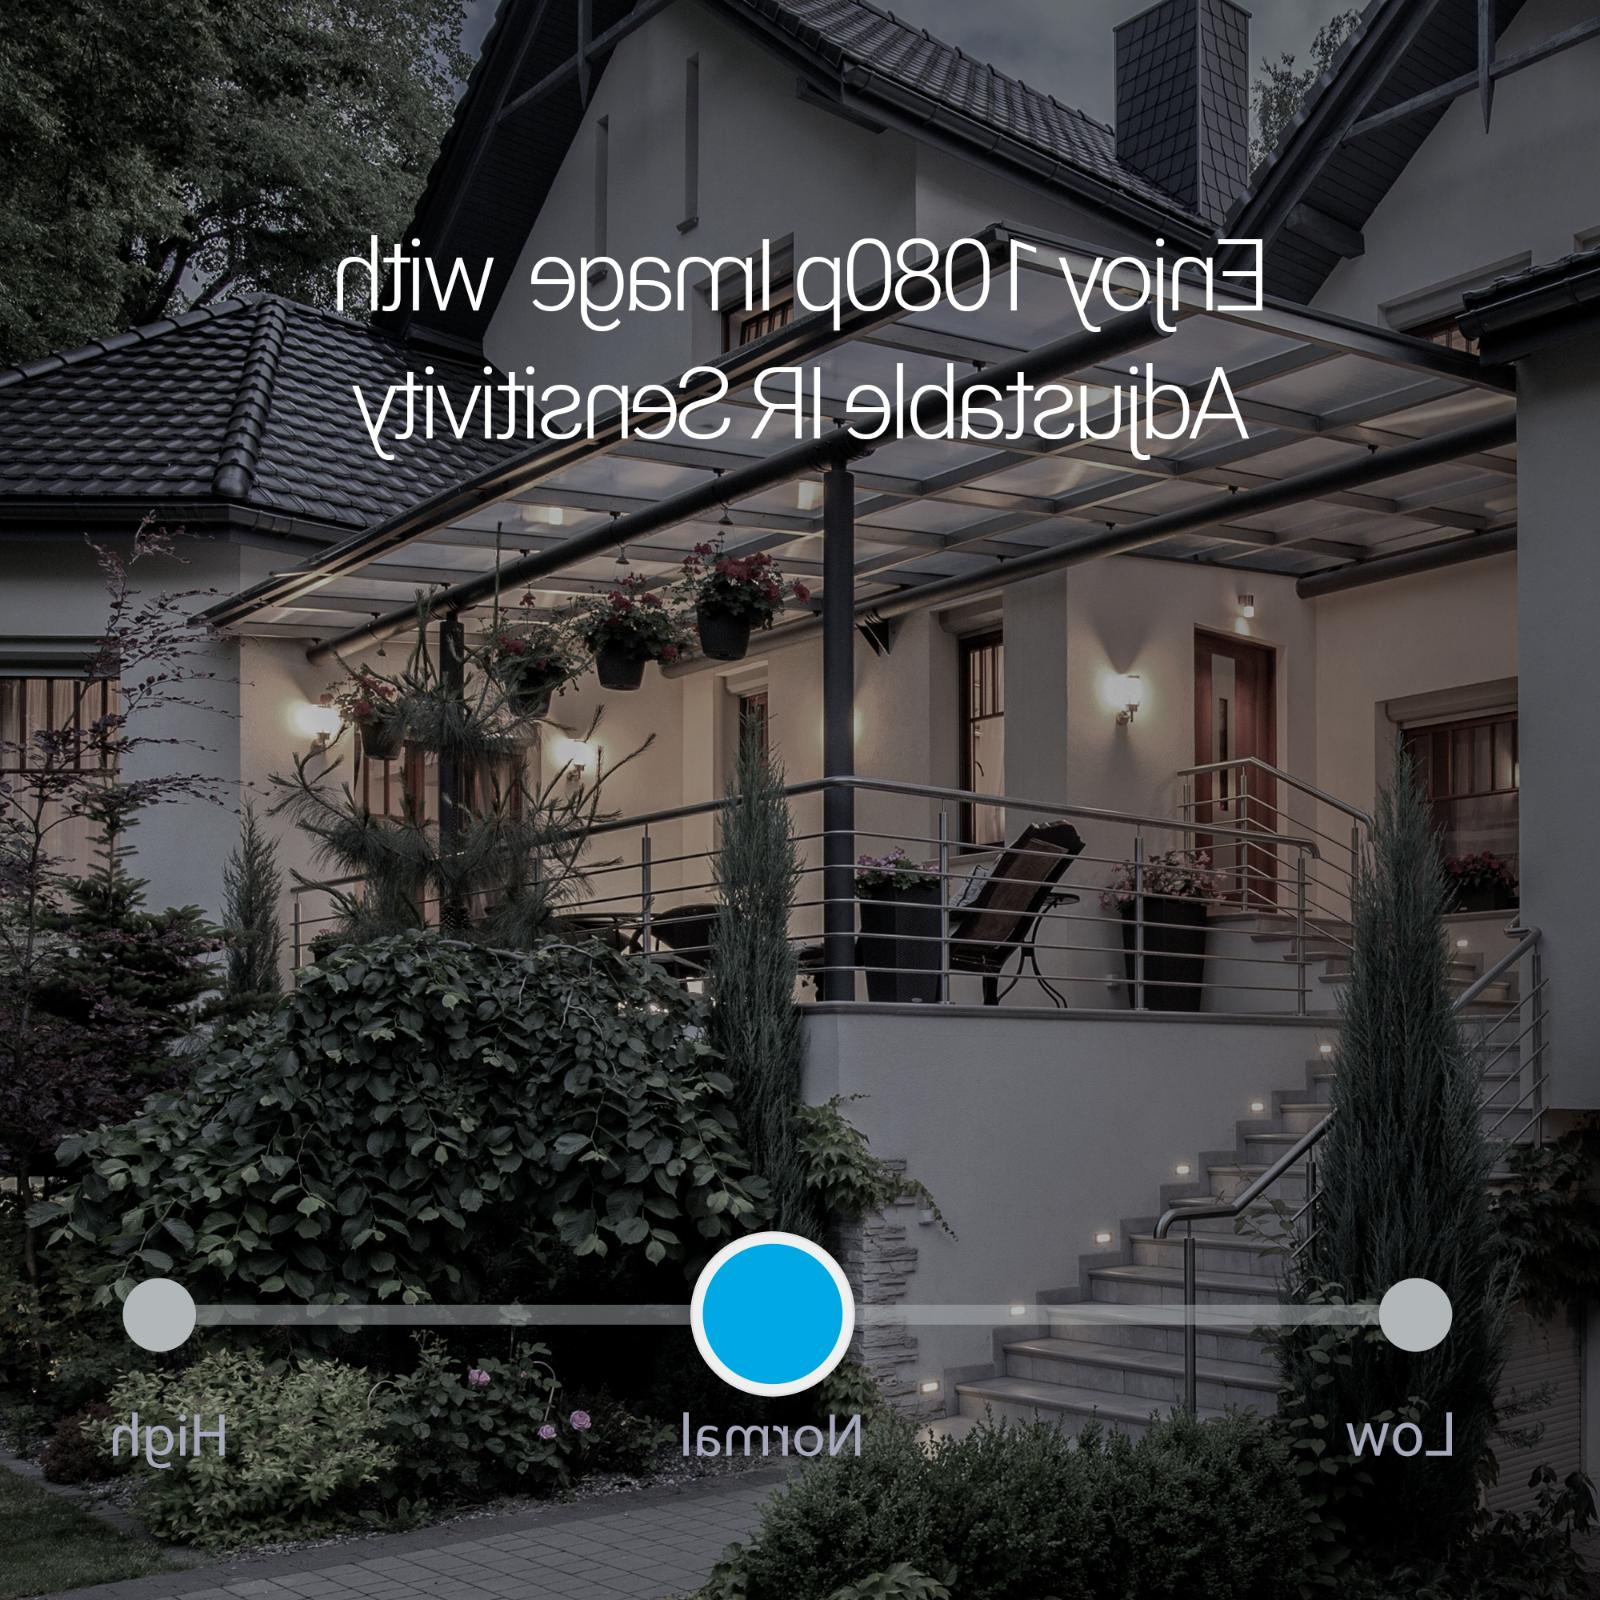 Zmodo 1080p Surveillance System Home